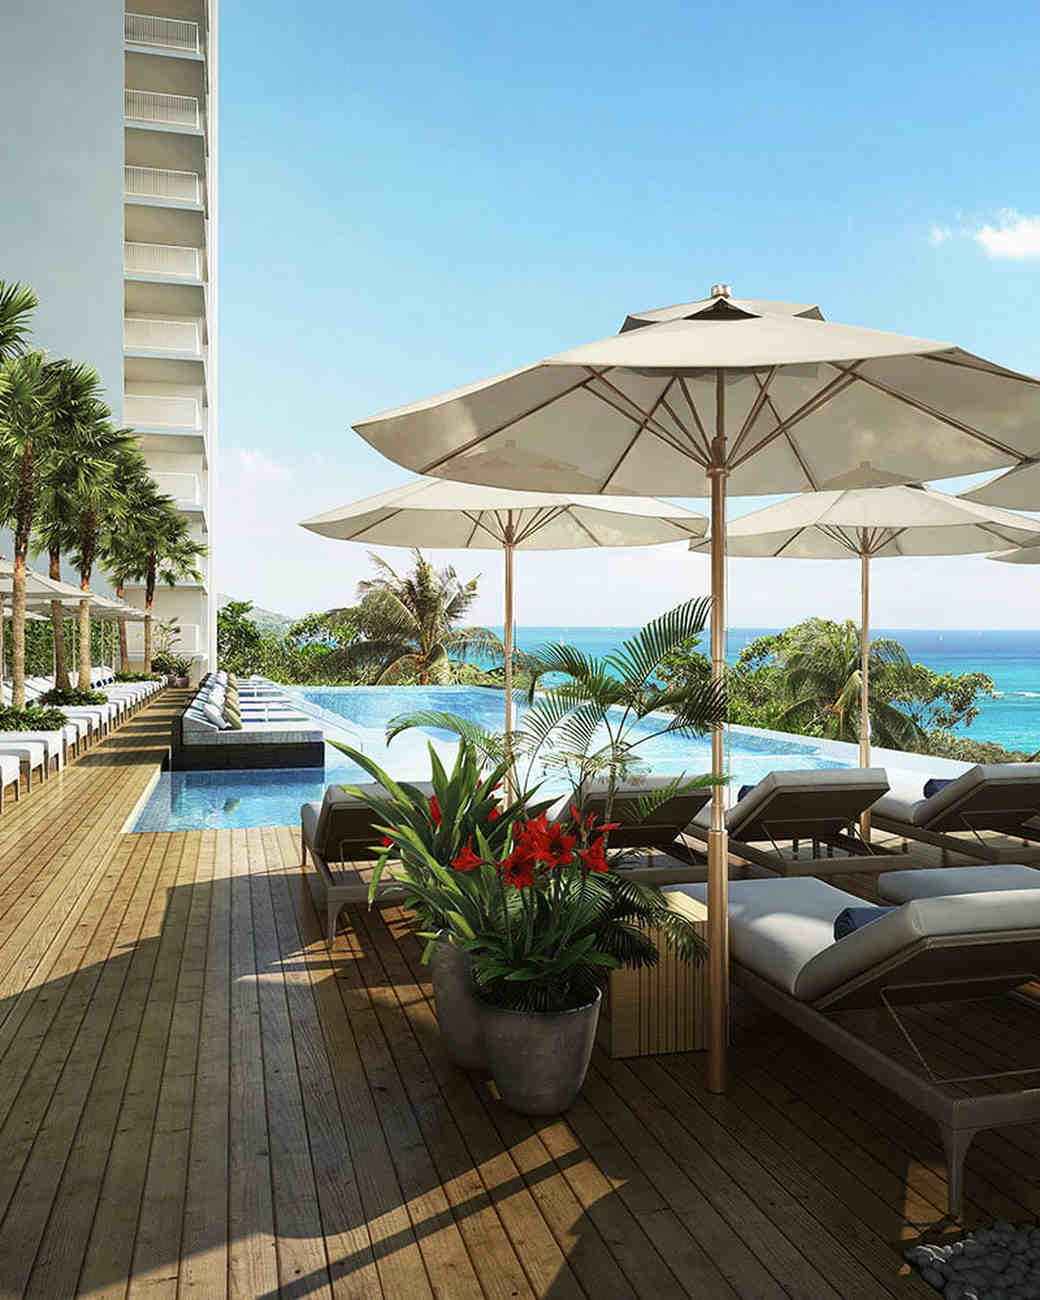 new venue outdoor beach umbrella patio seating